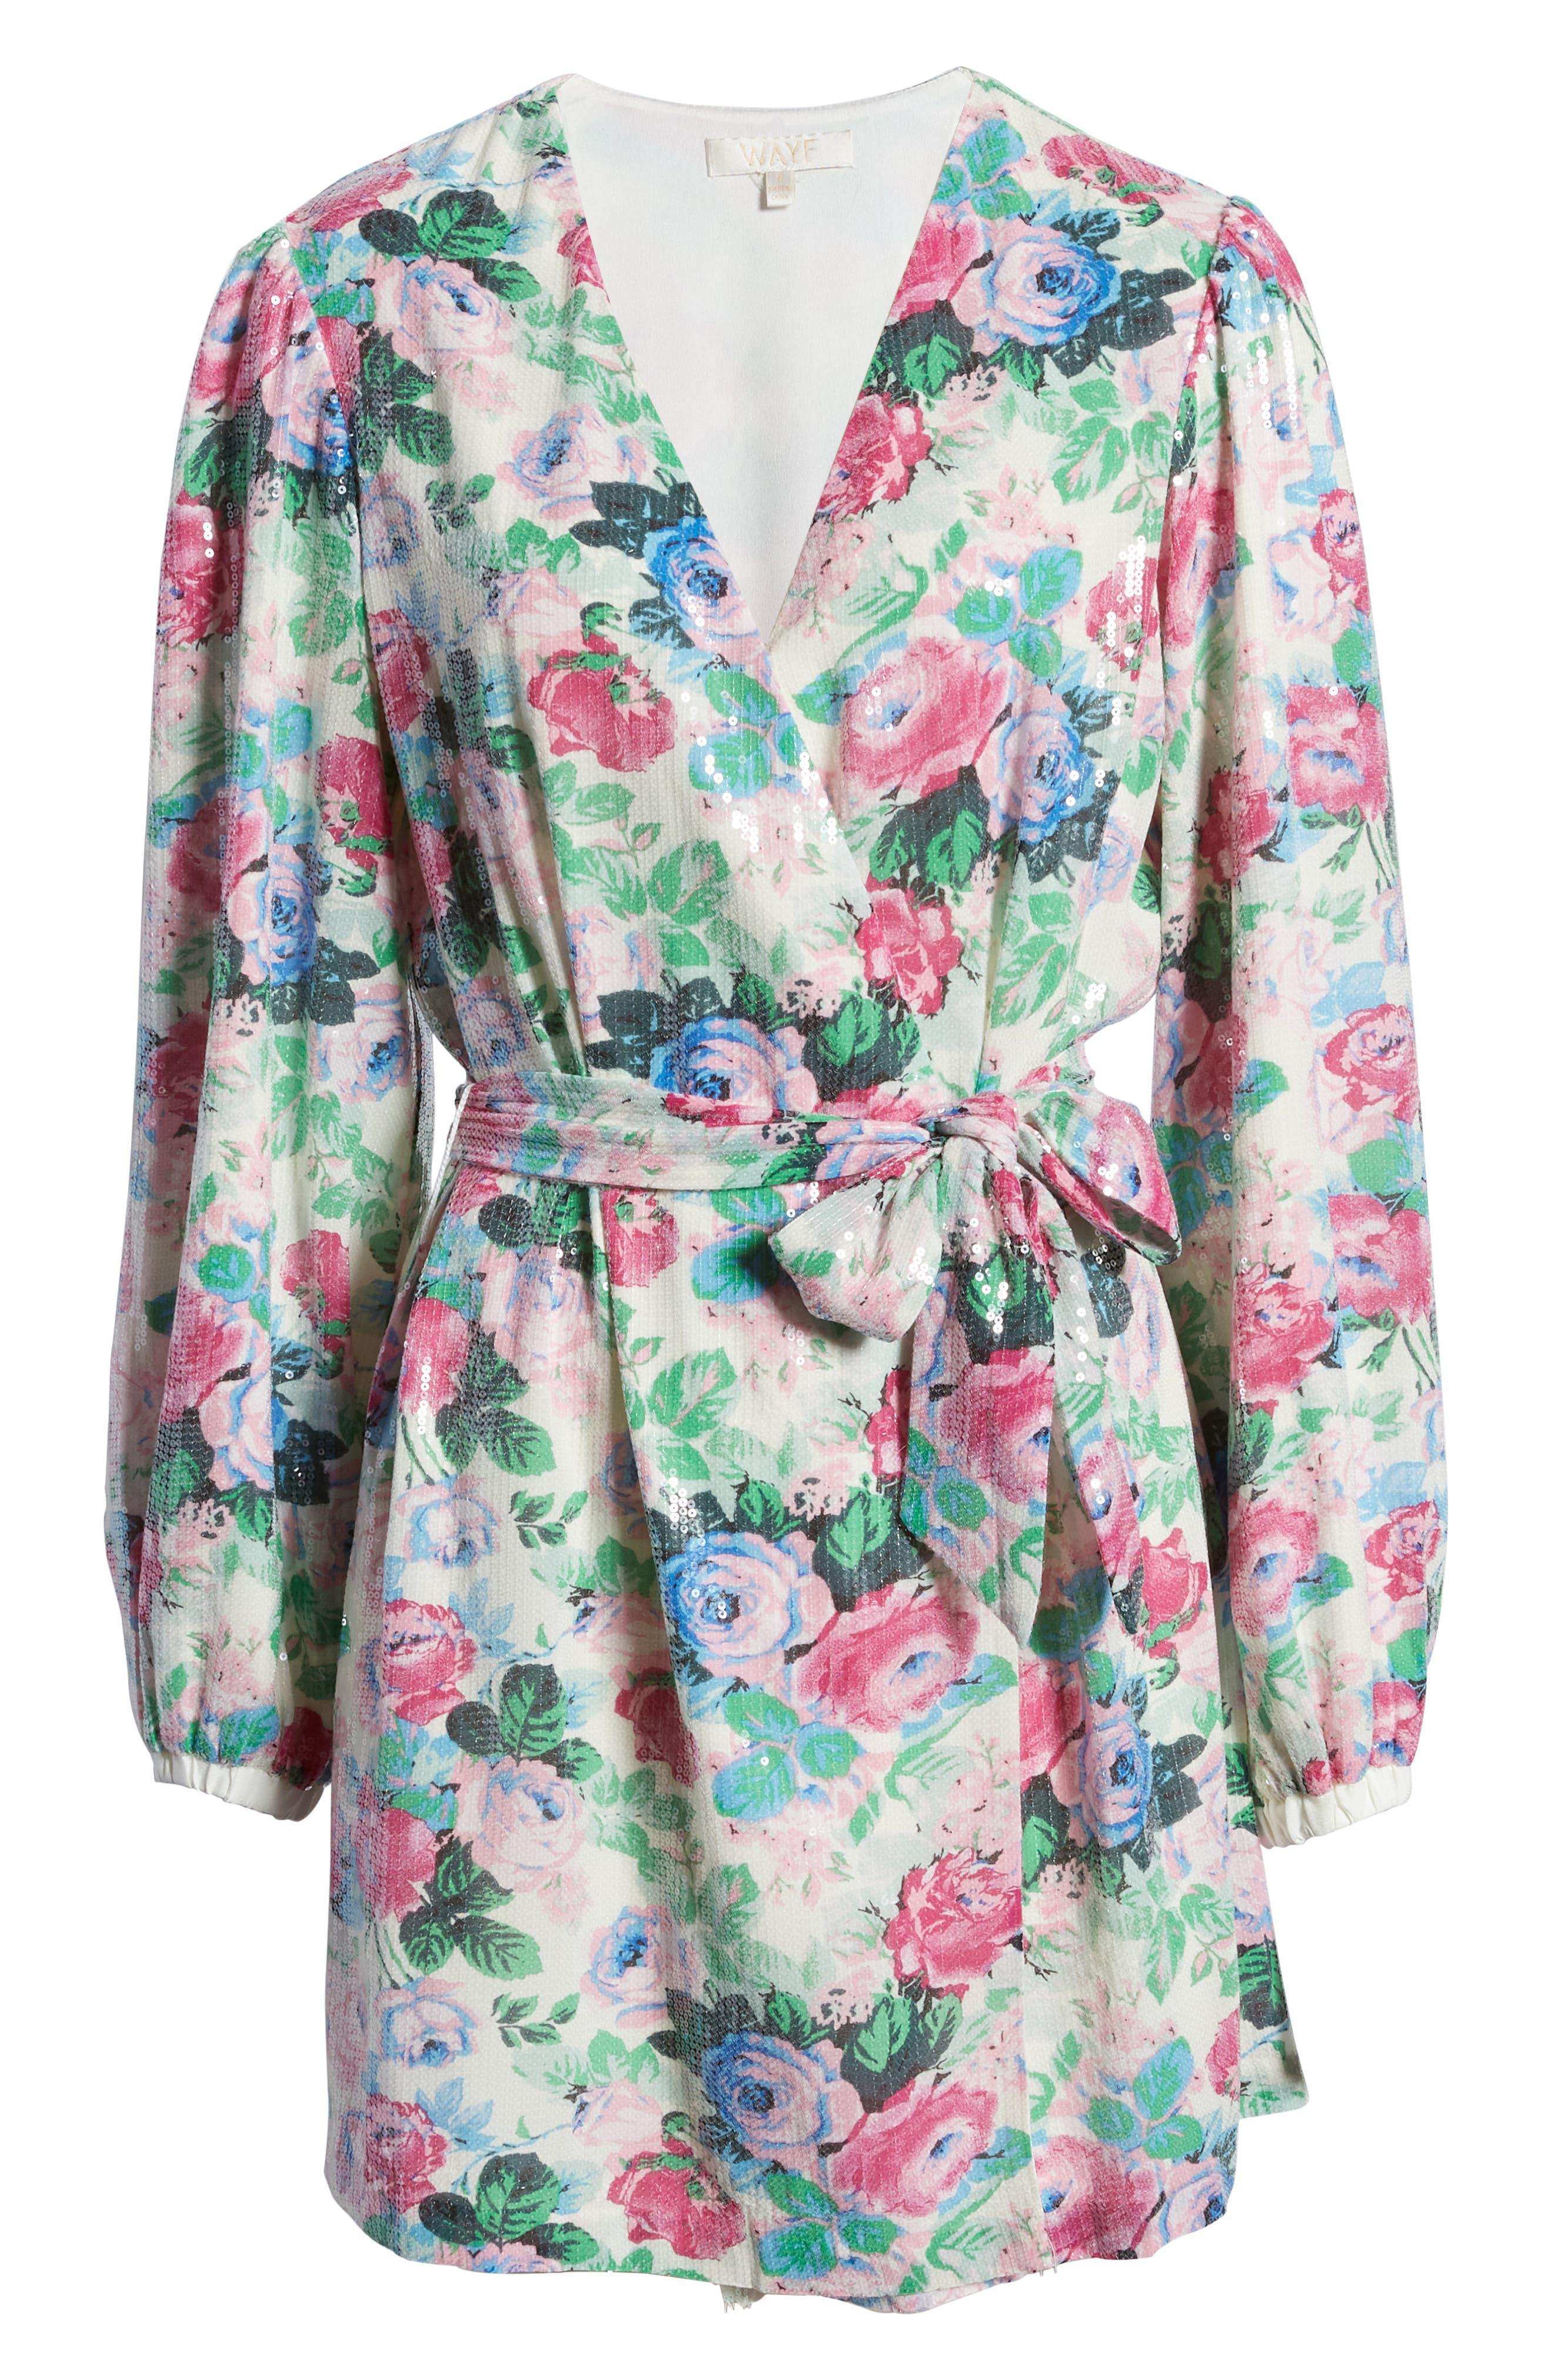 WAYF Loretta Floral Sequin Long Sleeve Wrap Dress